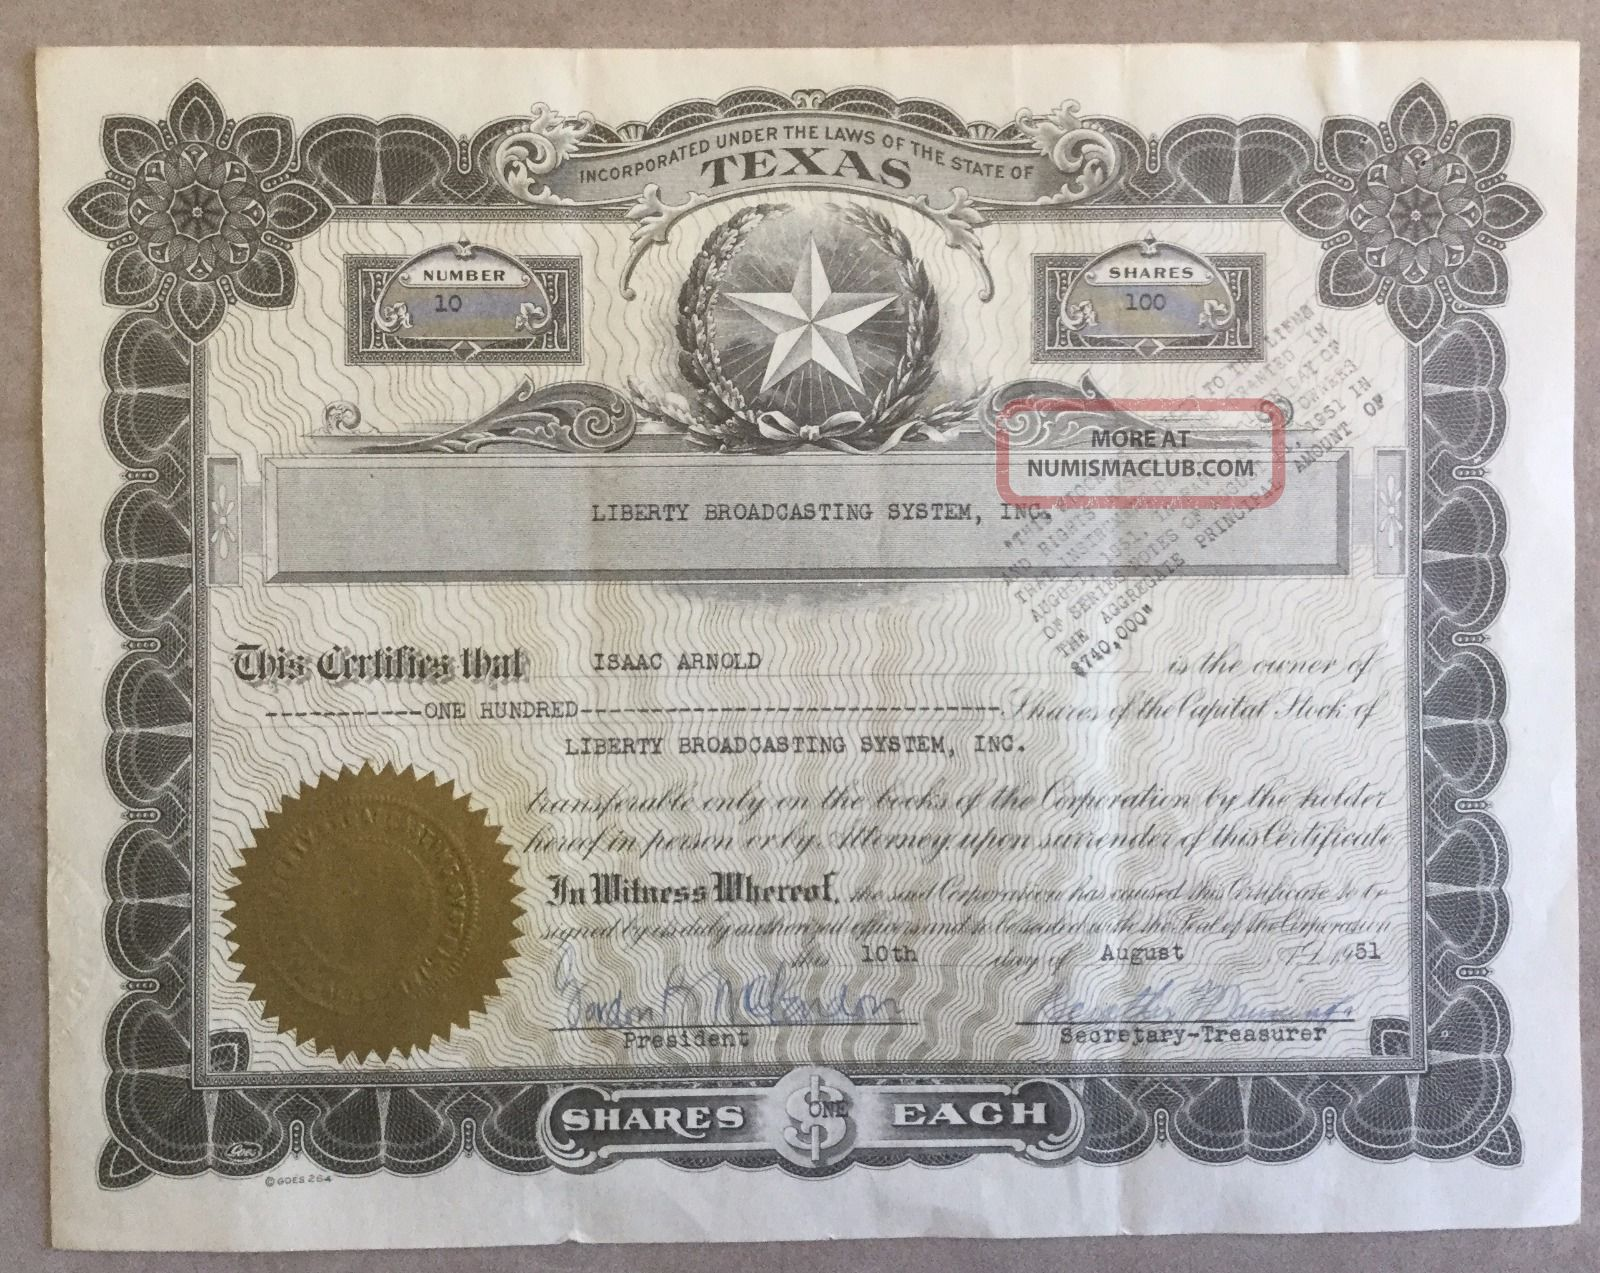 1951 Liberty Broadcasting System Stock Certificate Signed By Gordon Mclendon Stocks & Bonds, Scripophily photo